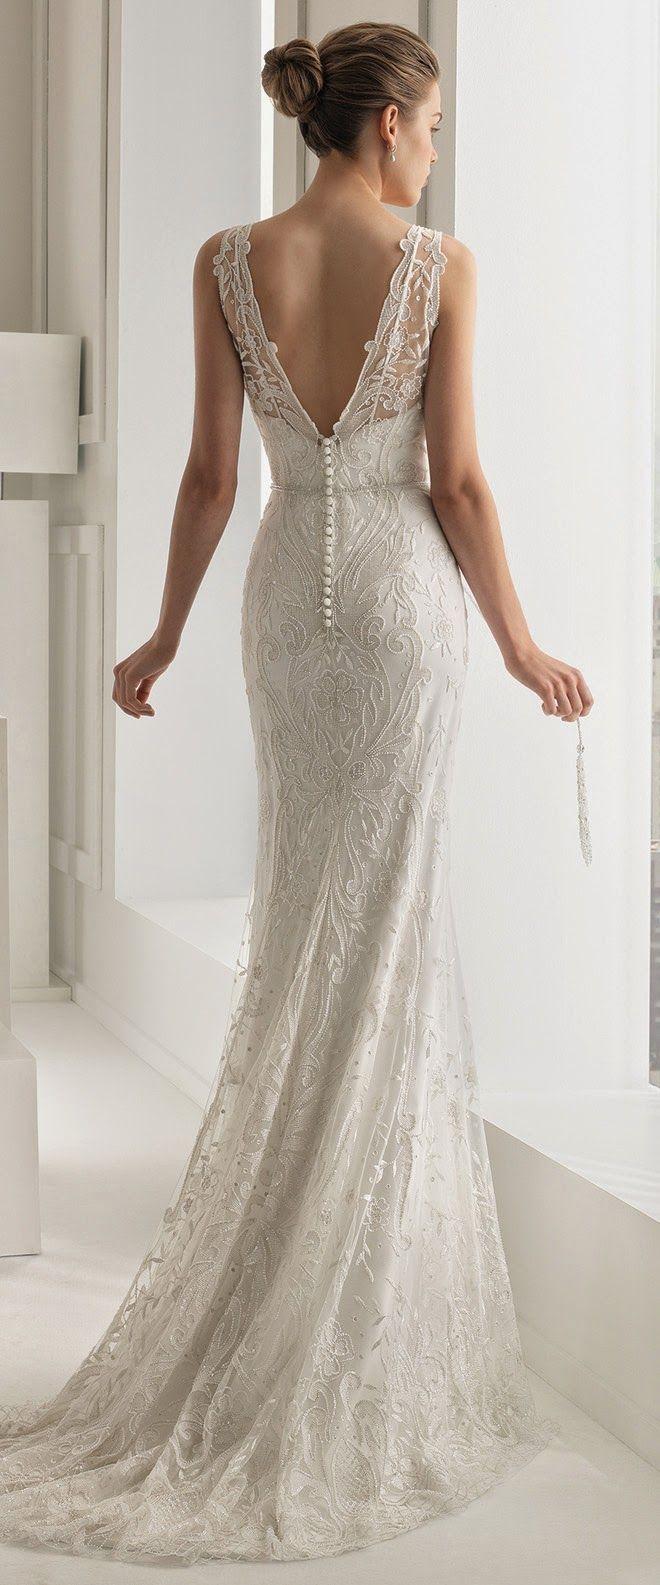 Rosa Clara 2015 Bridal Collection - Part 2 - Belle The Magazine